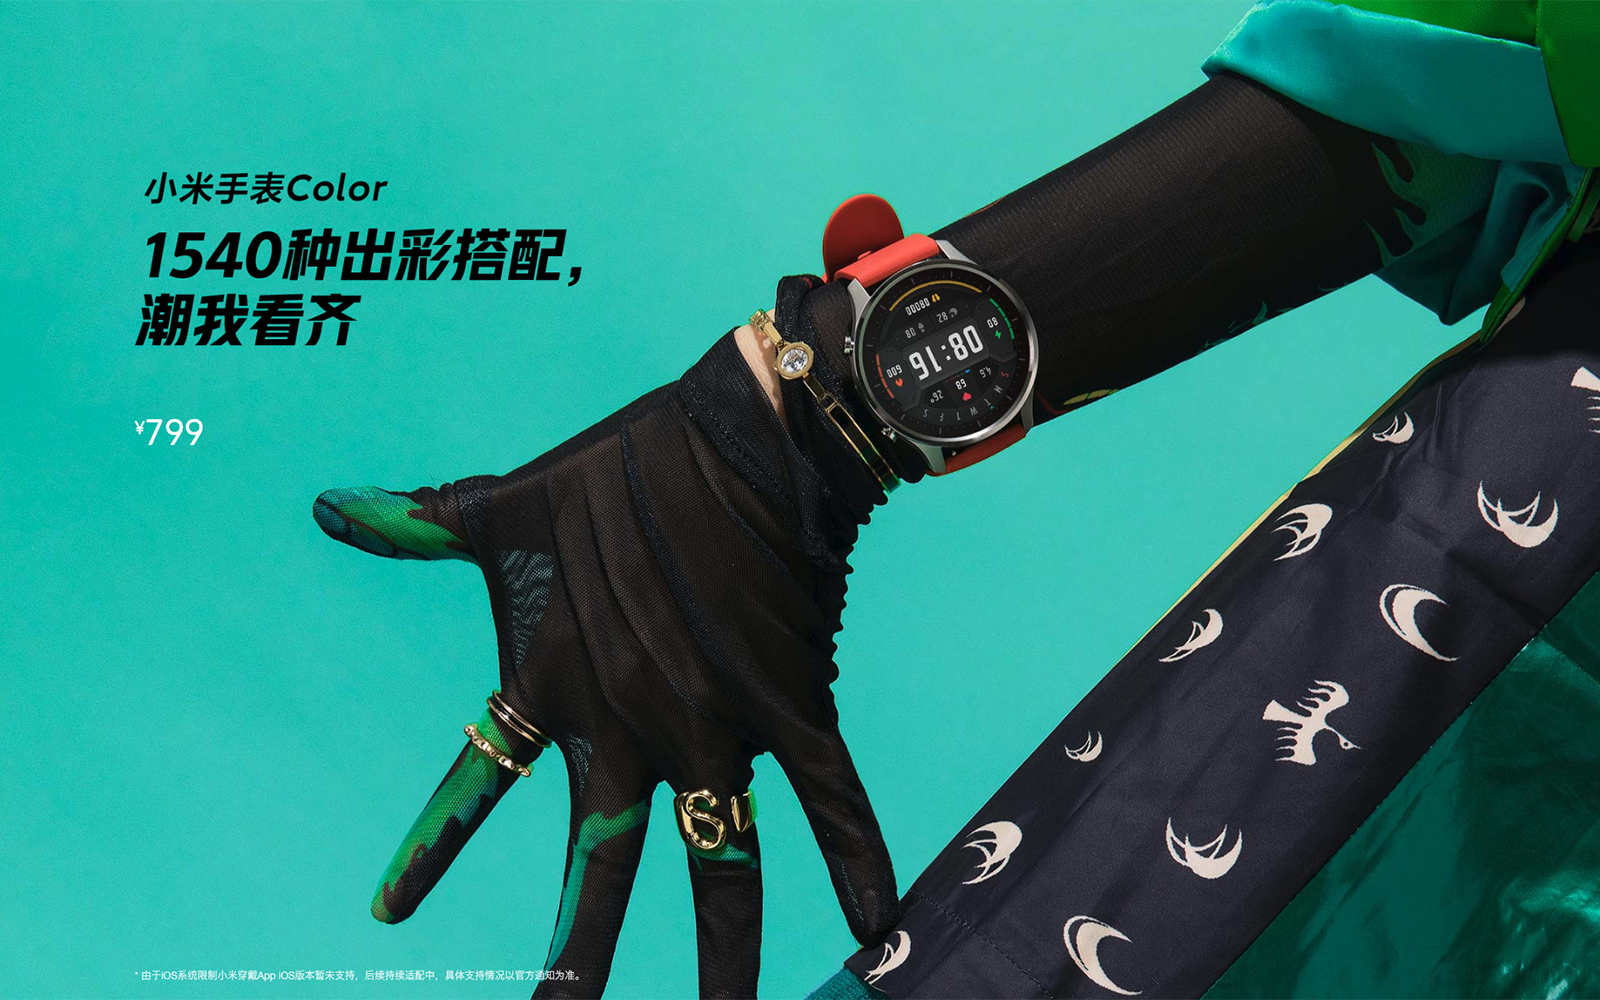 小米手錶 Color